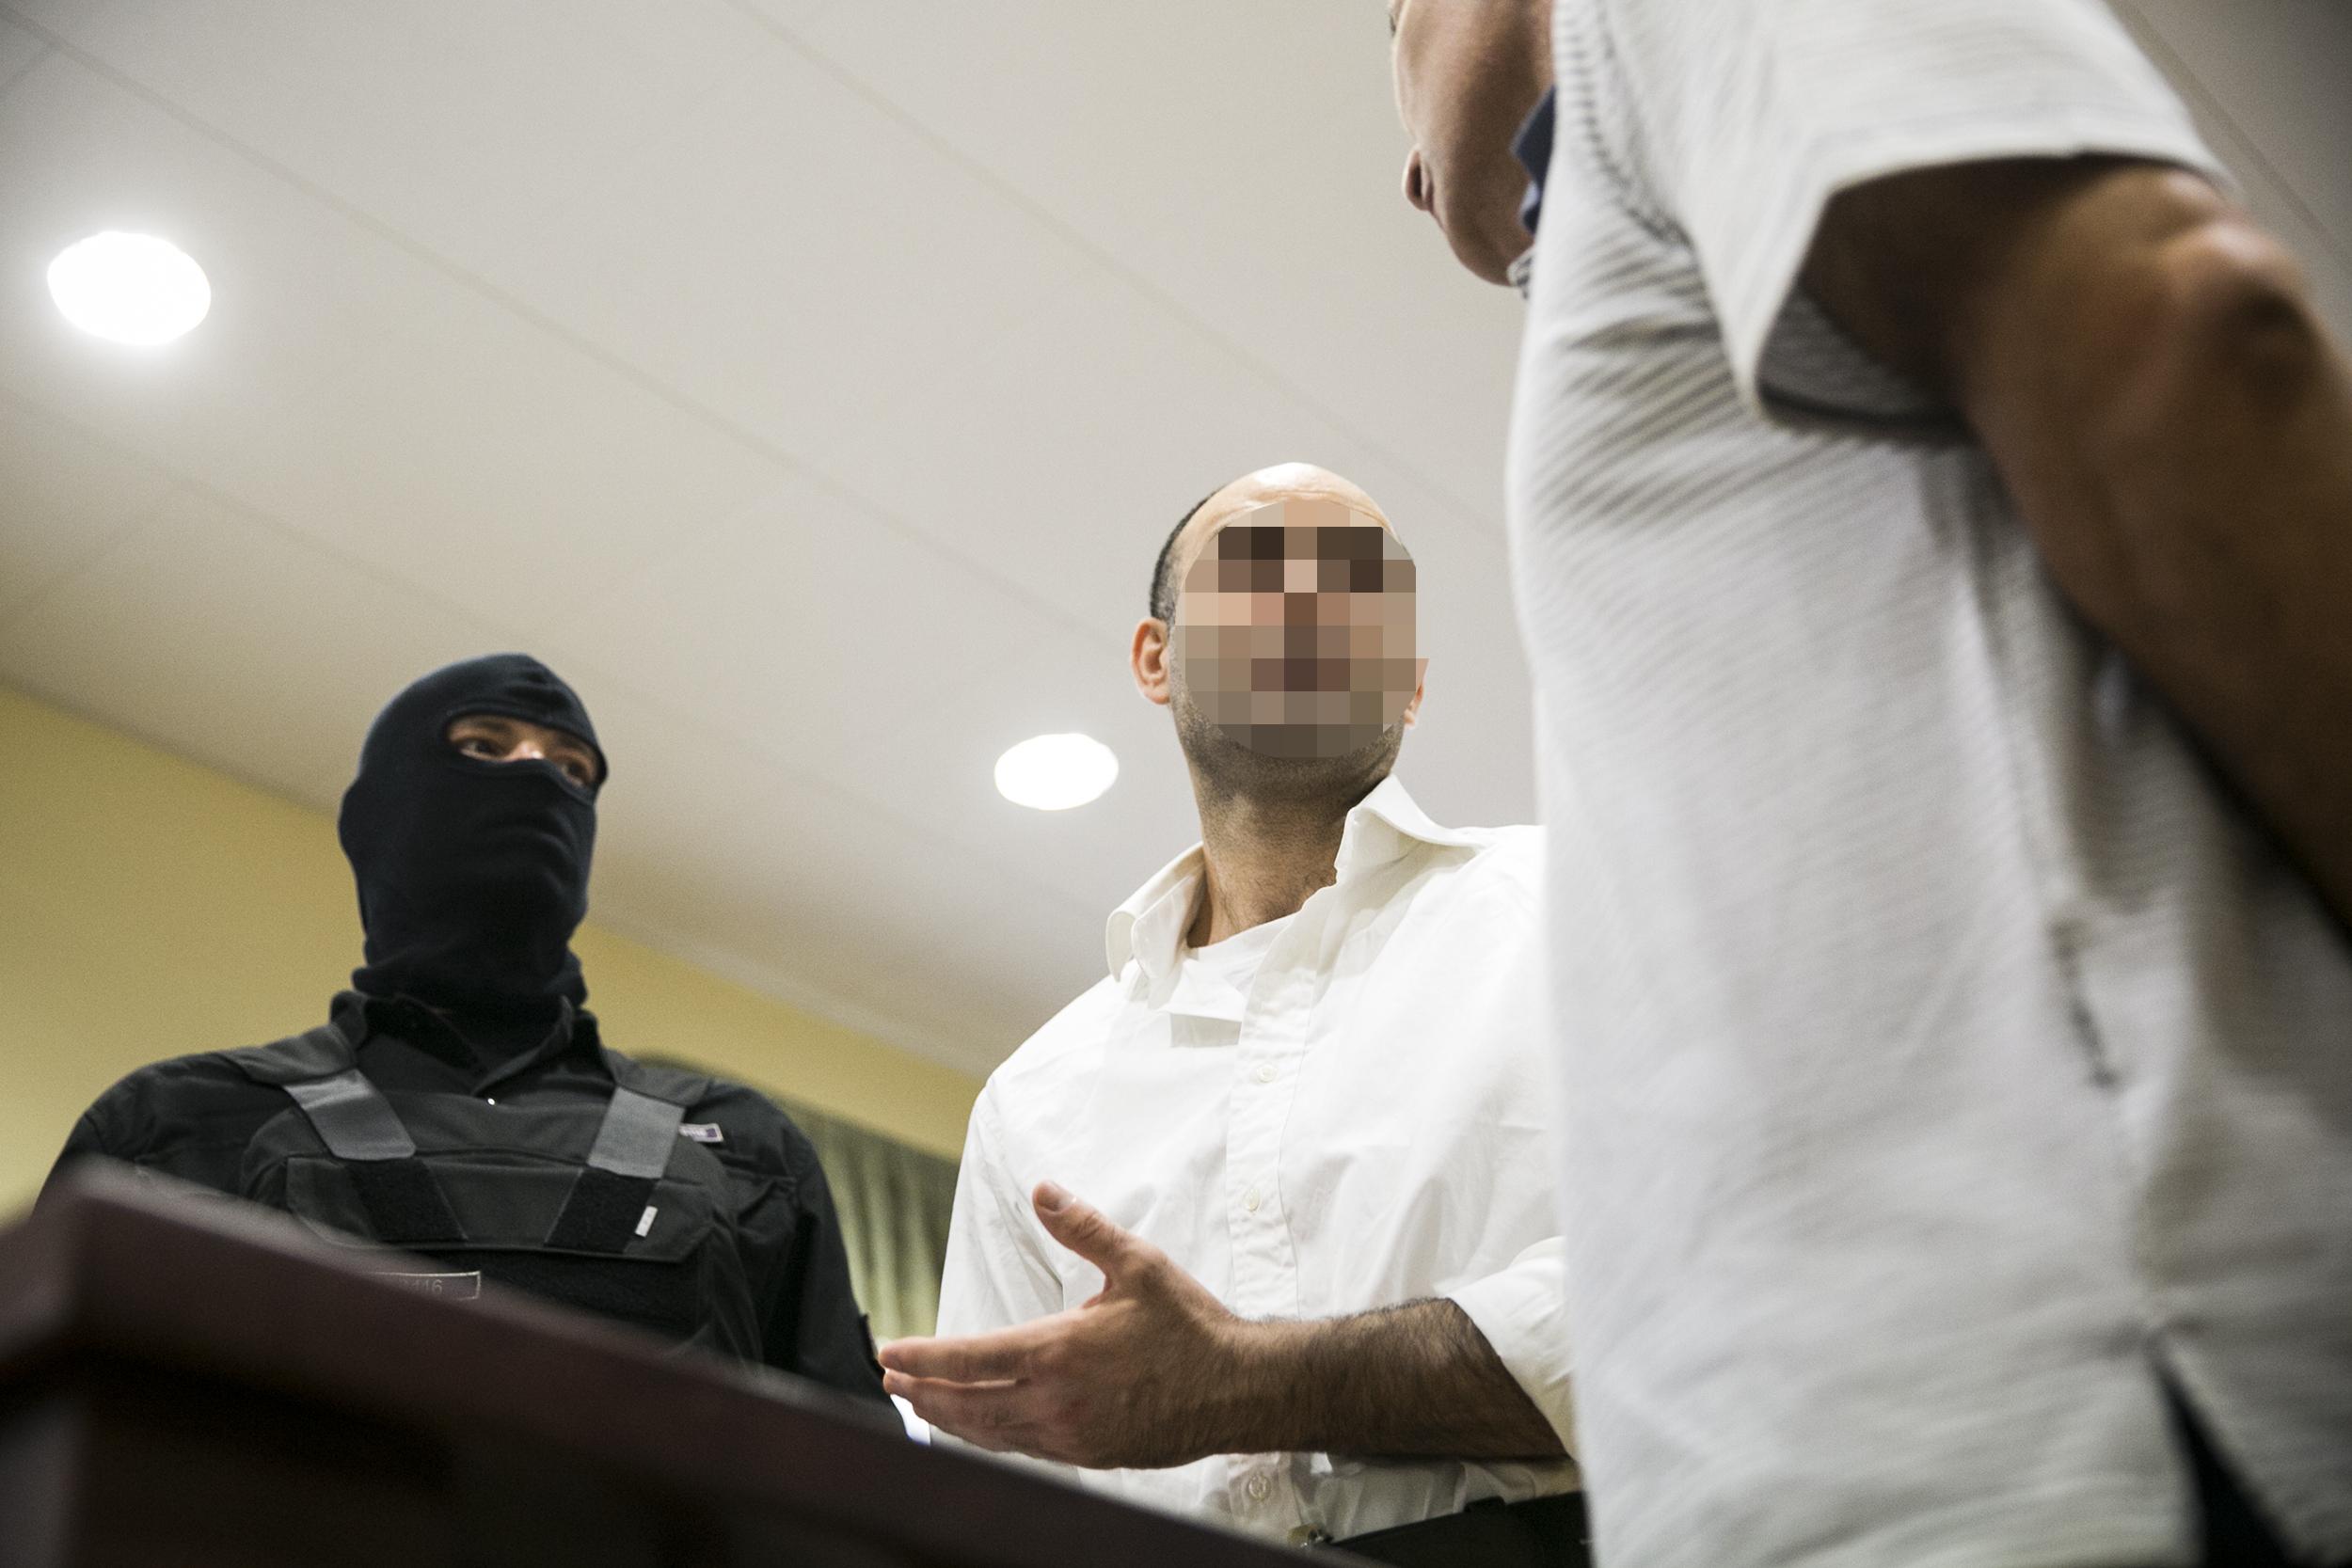 Ahmed H. ártatlannak vallotta magát